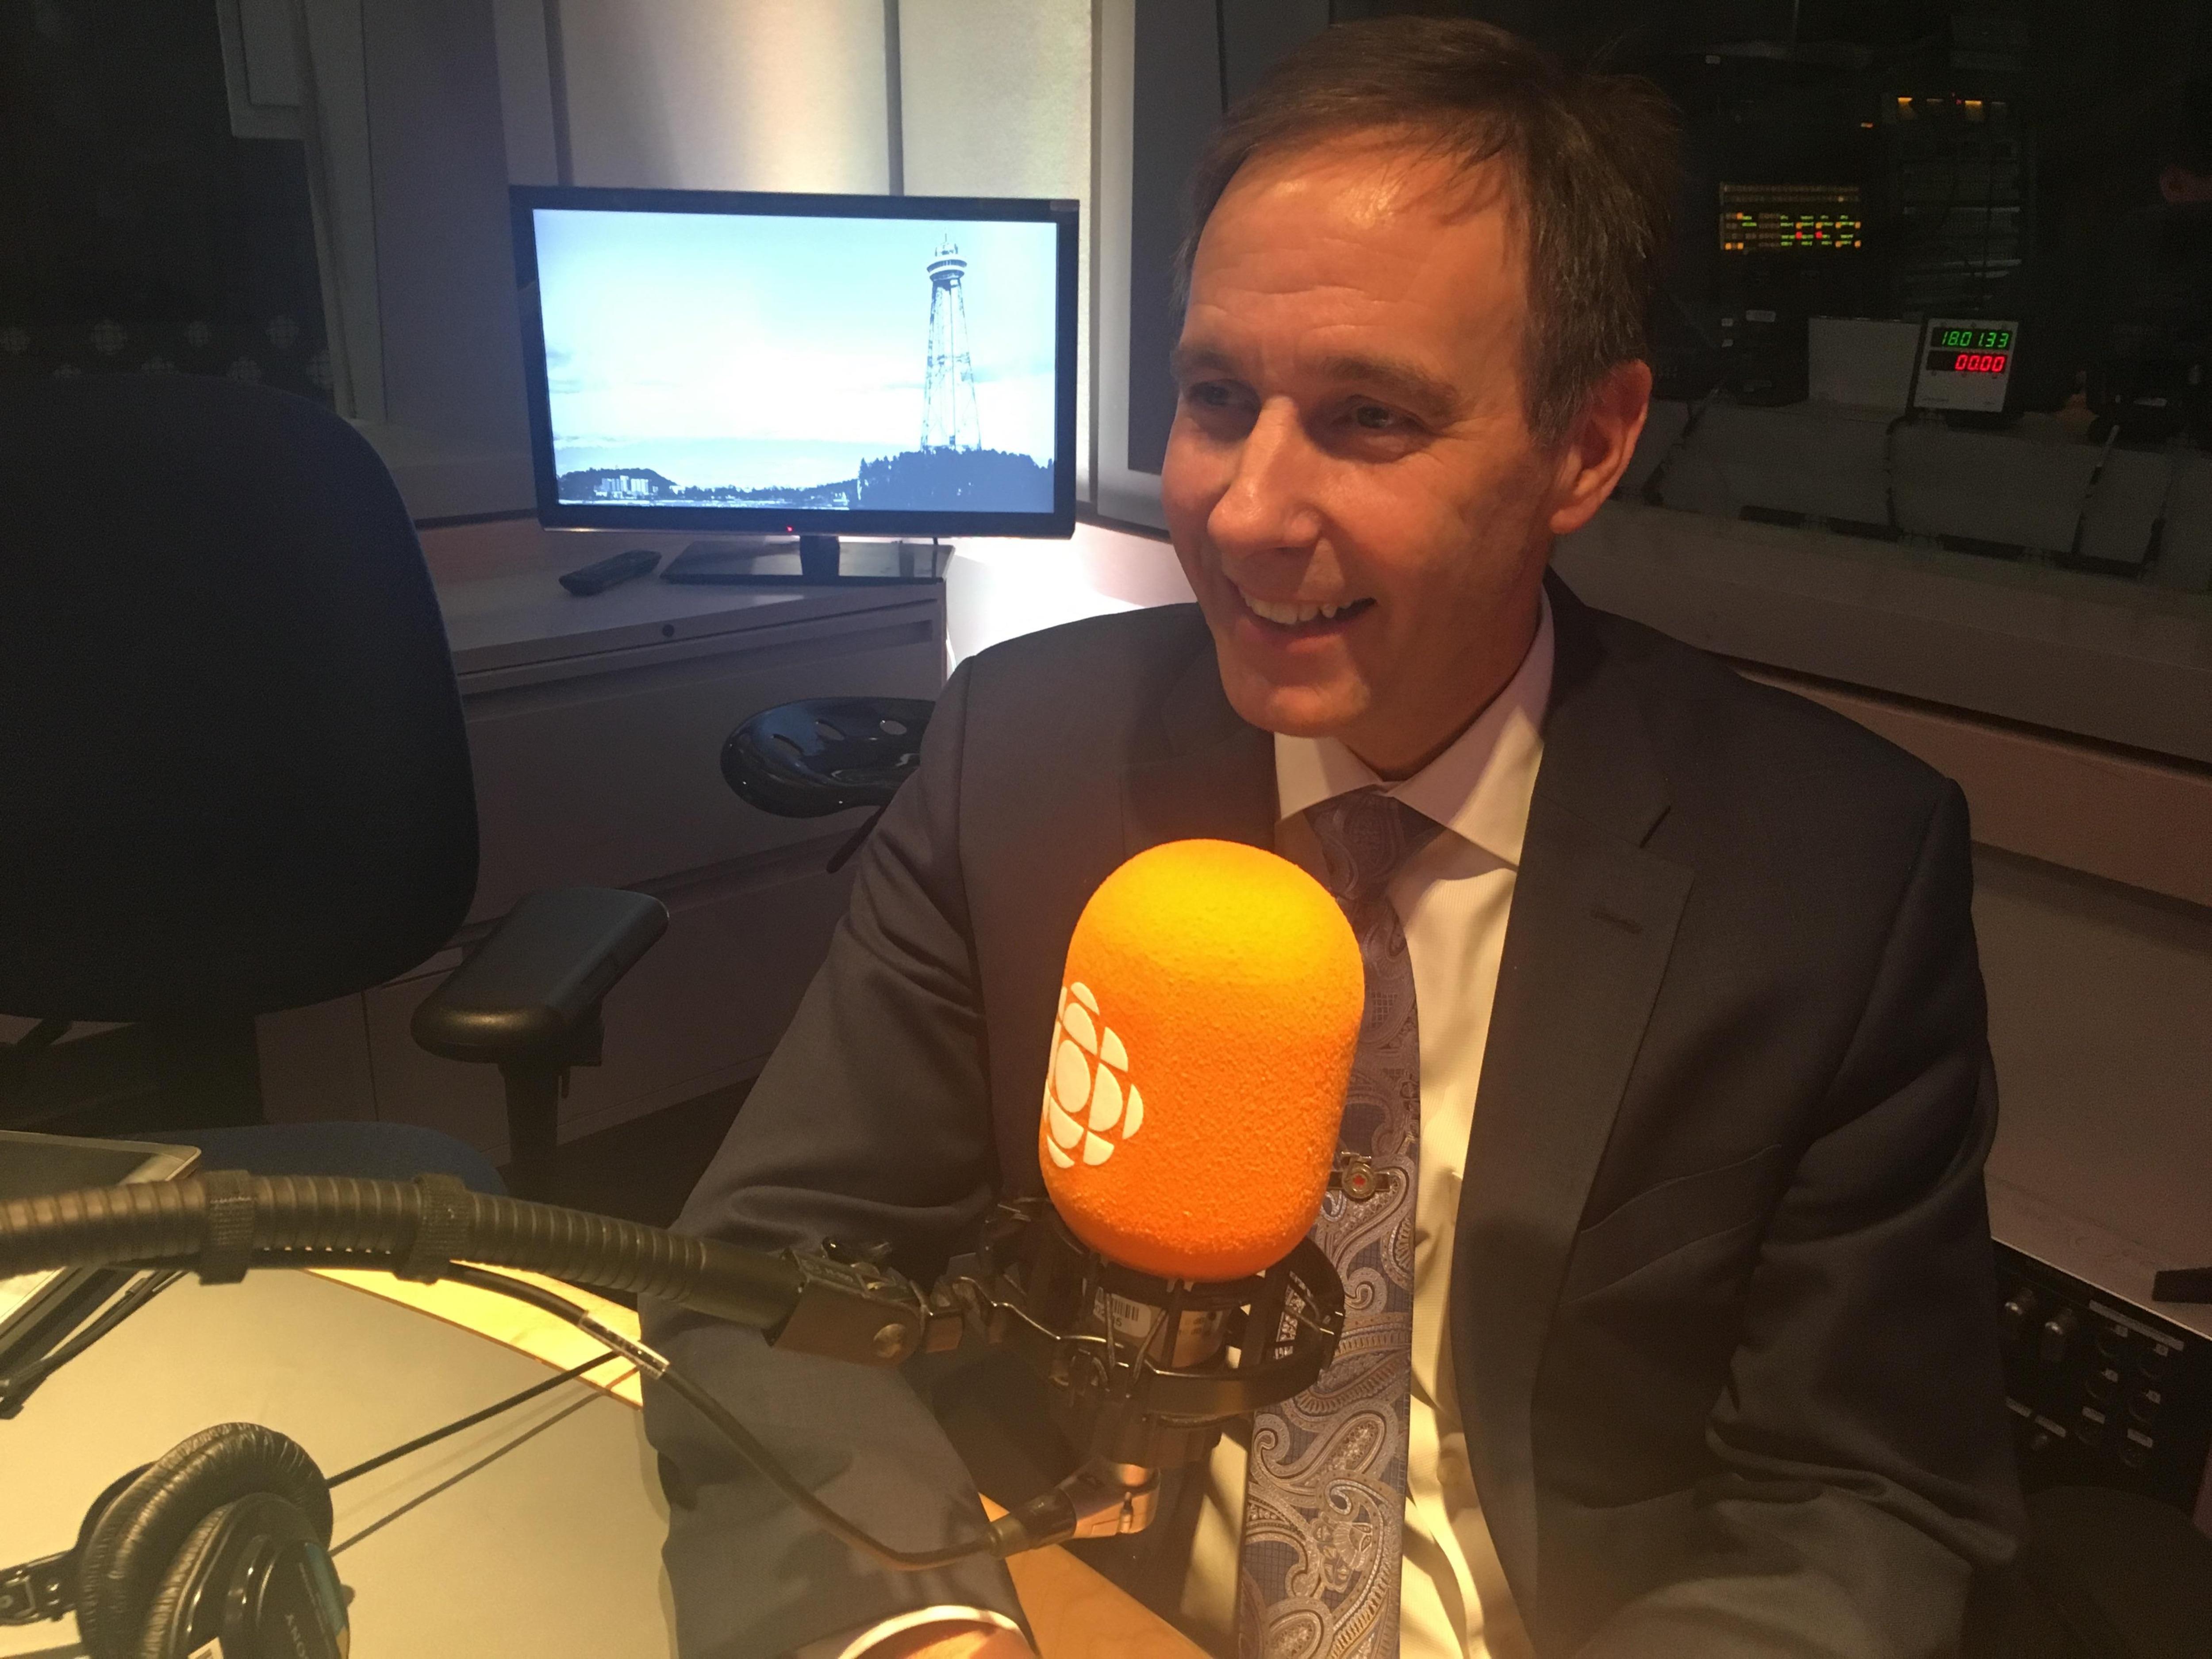 Jean-Éric Guindon